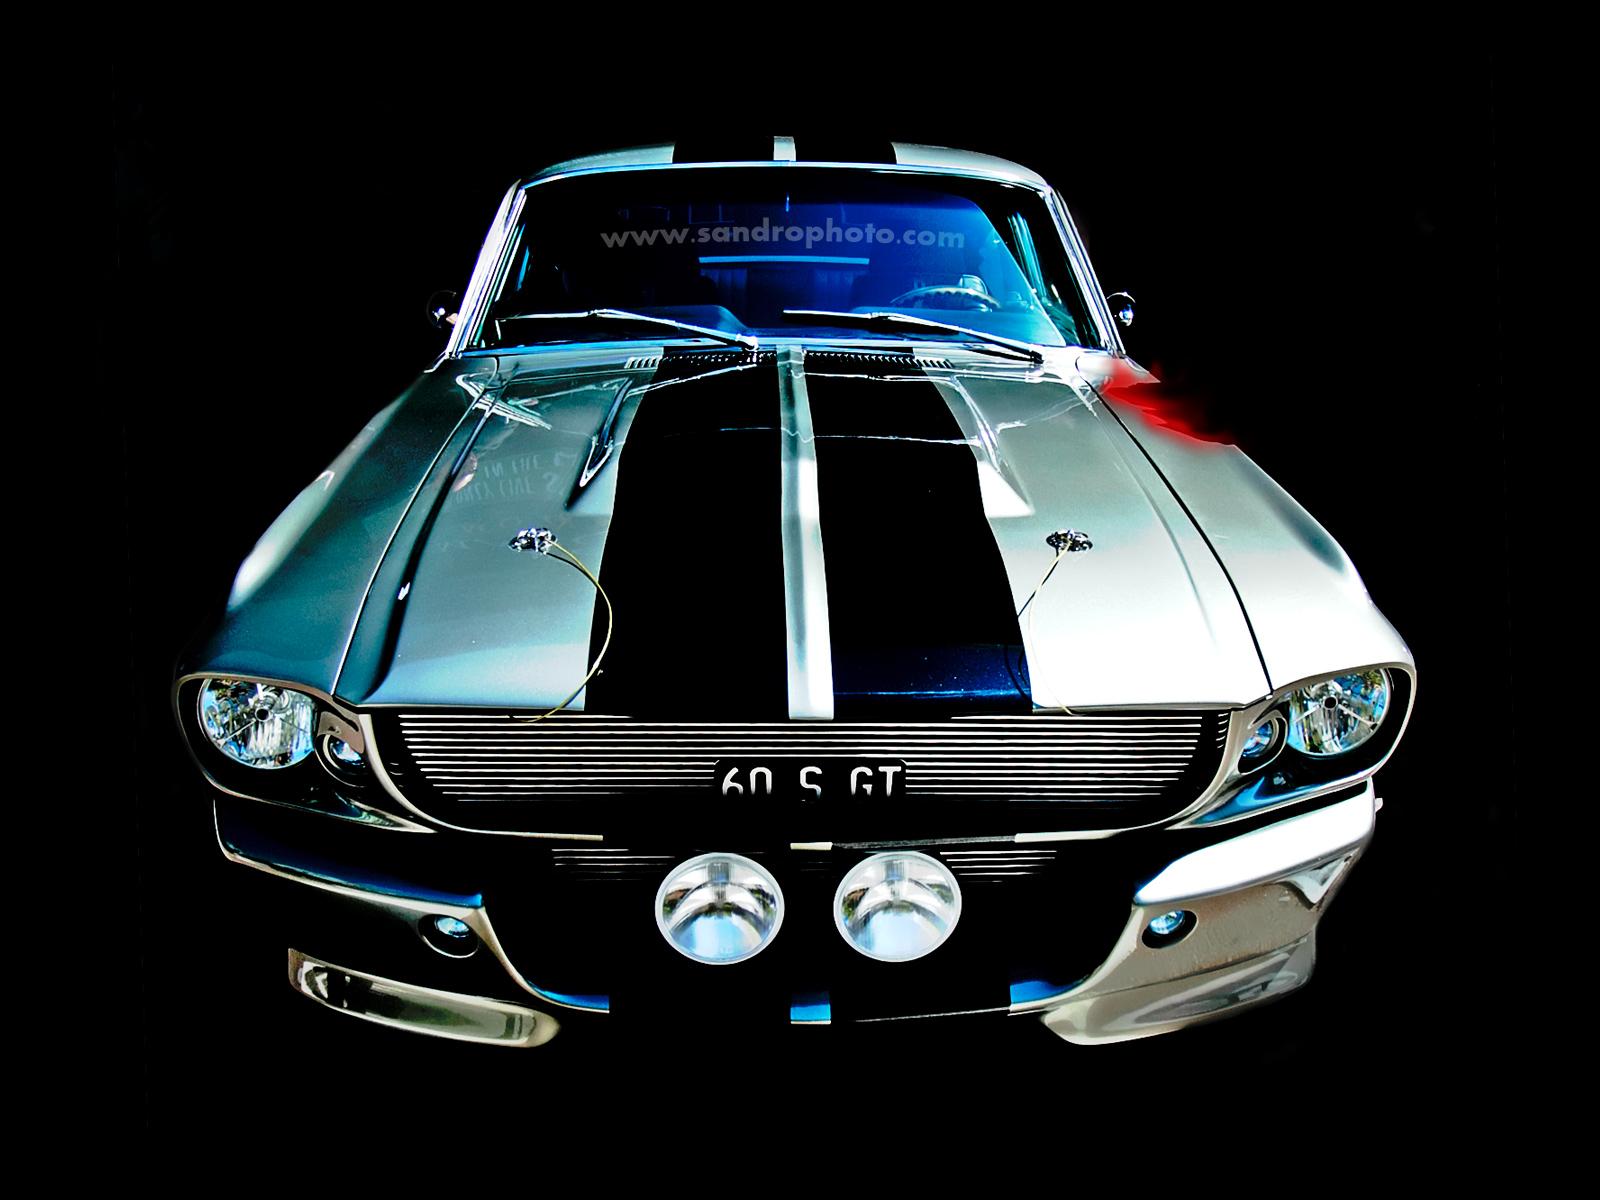 Muscle%252Bcar%252Bwallpaper%252B5 Hd Exotic Car Wallpapers